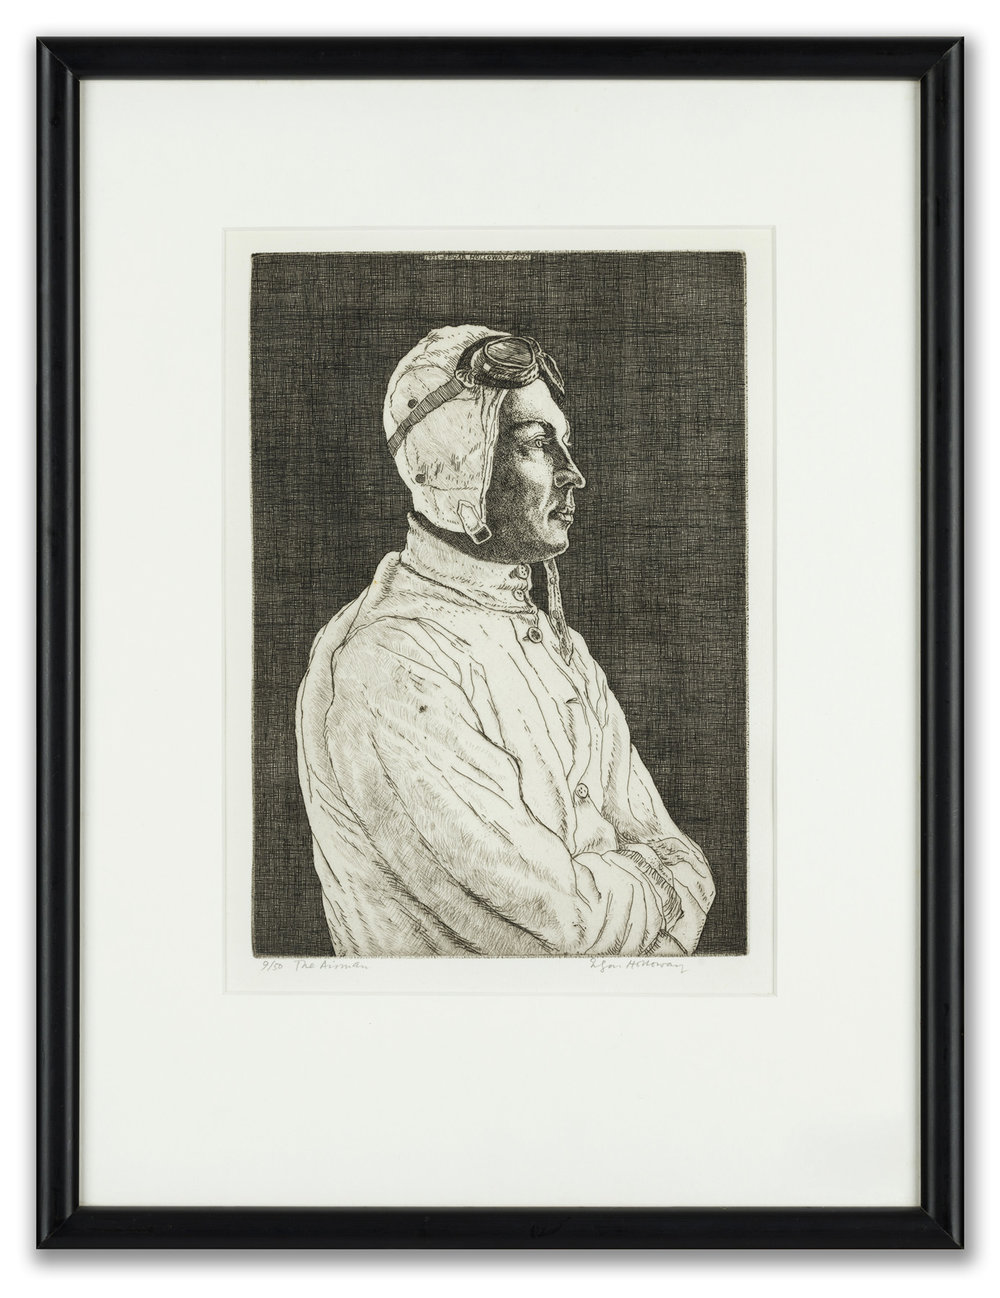 Edgar Holloway, (British 1914-2008), The Airman II, 1993.